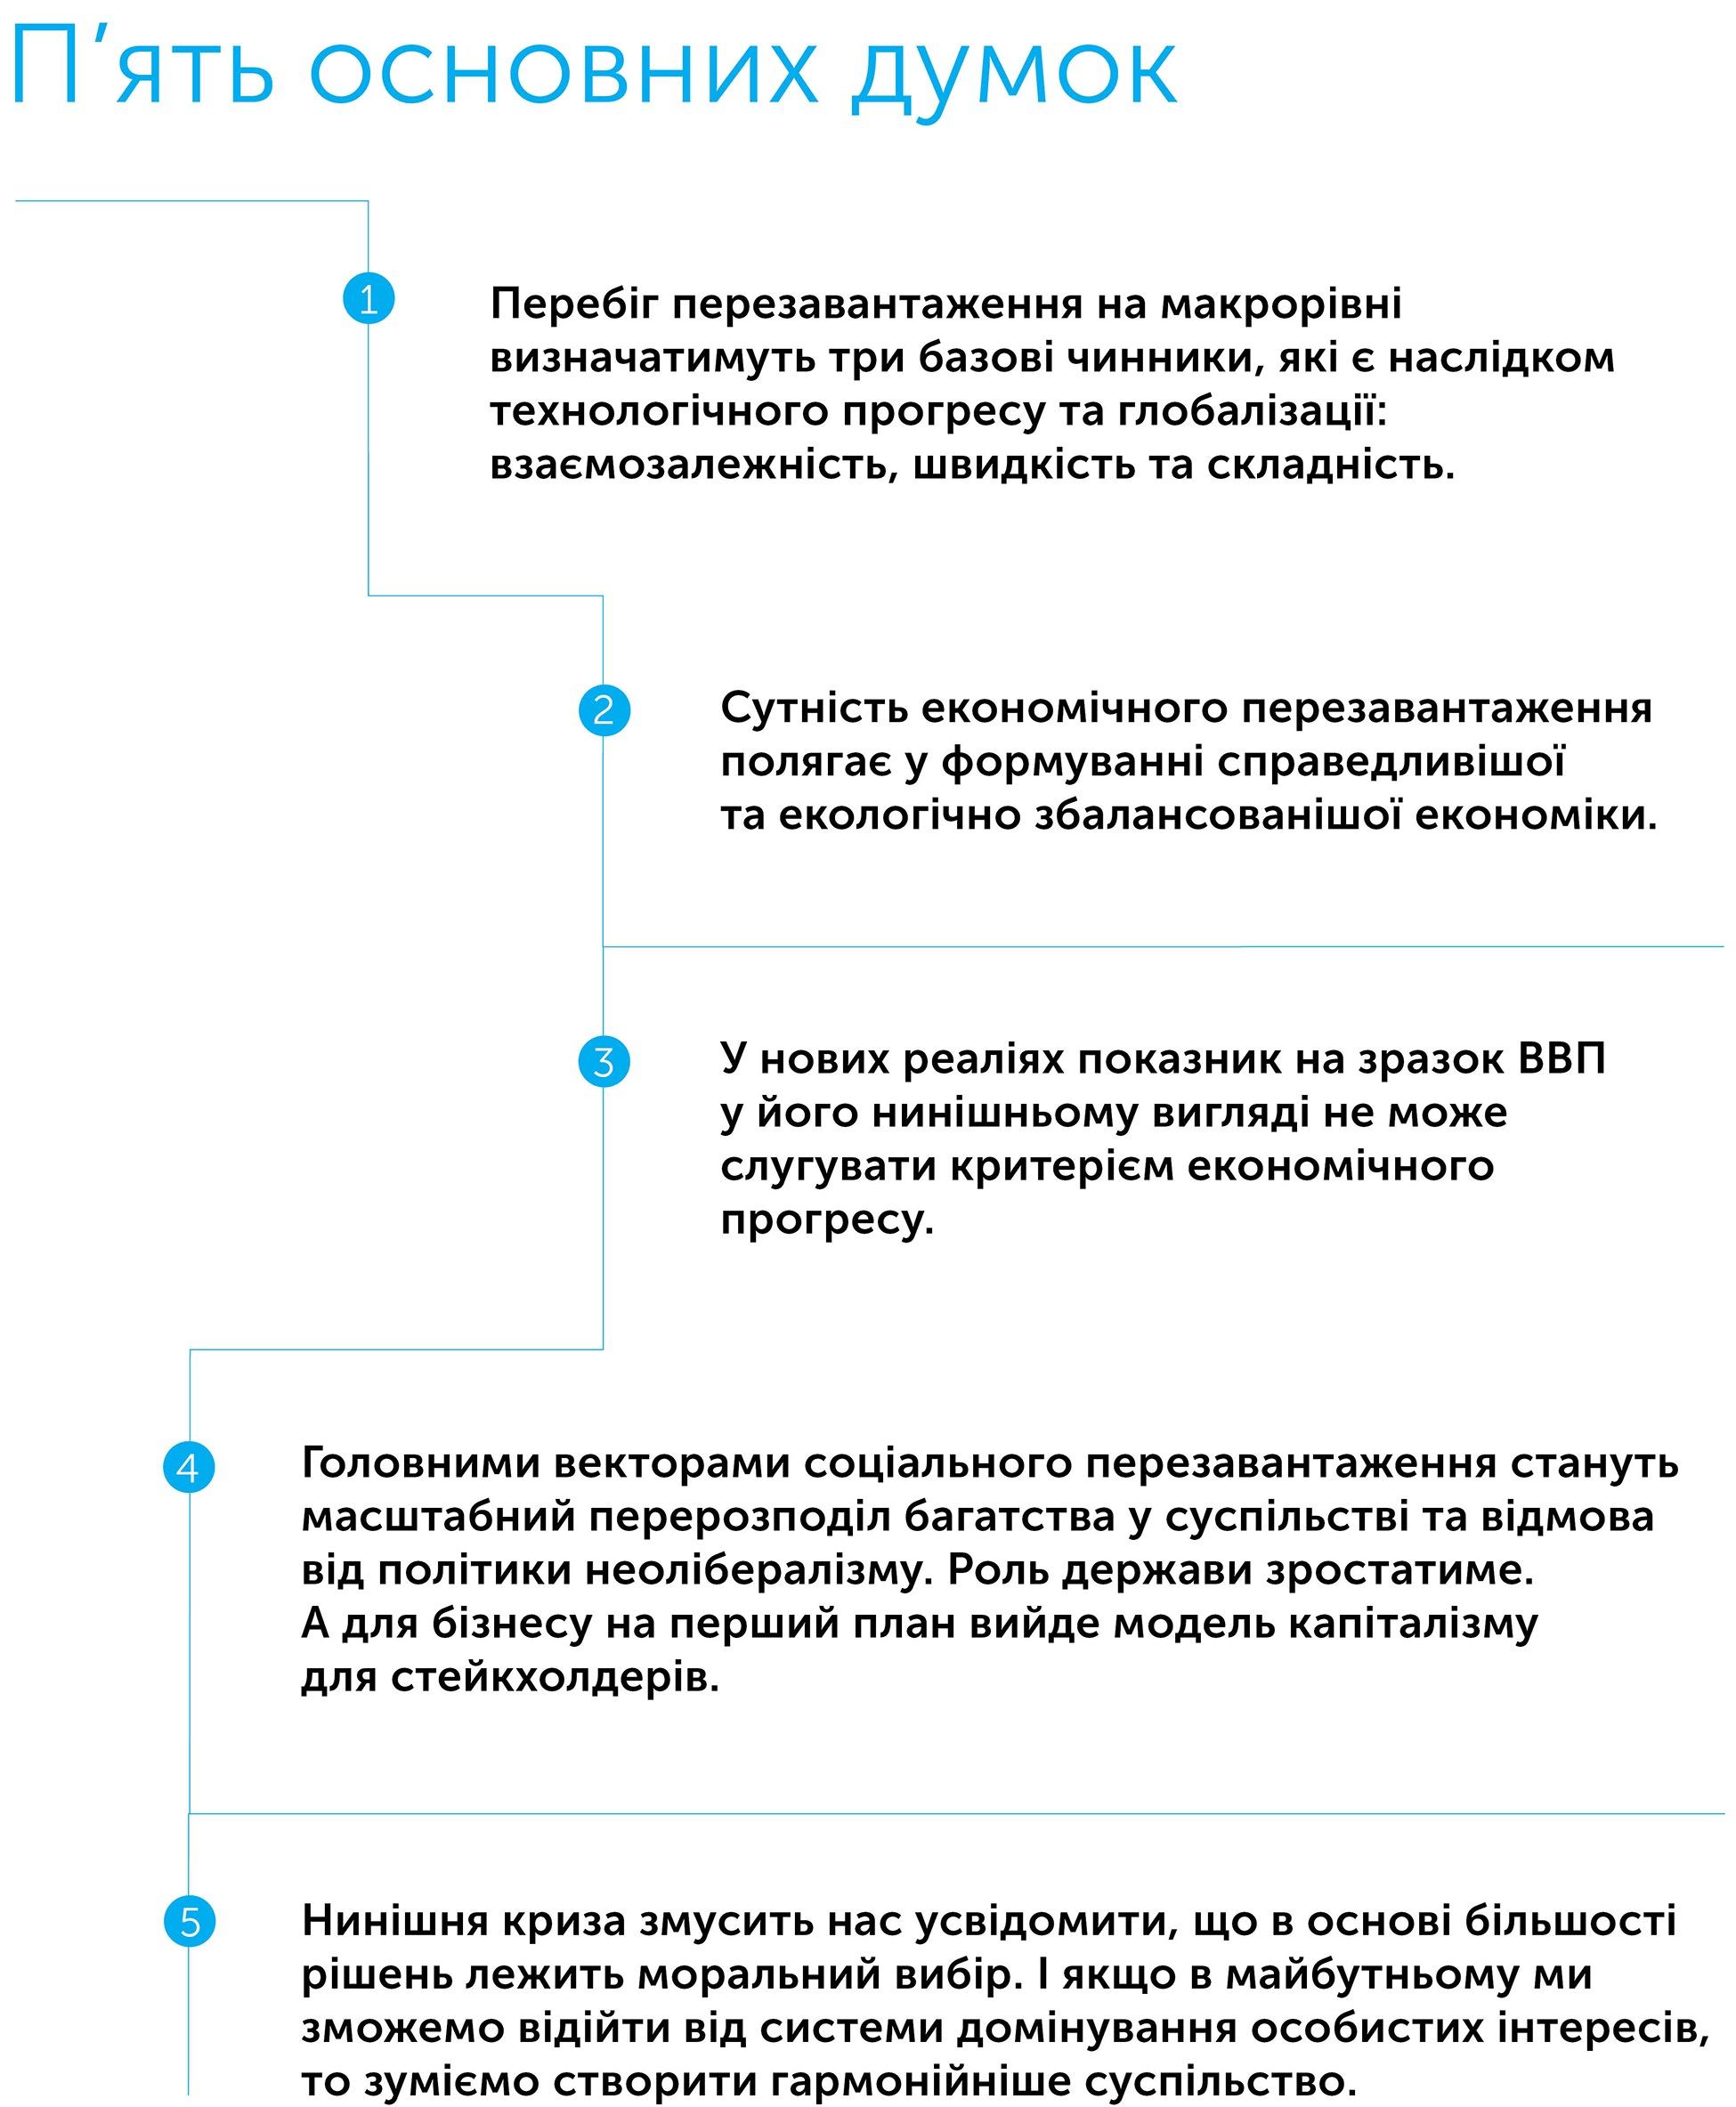 COVID-19, автор Клаус Шваб | Kyivstar Business Hub, зображення №2